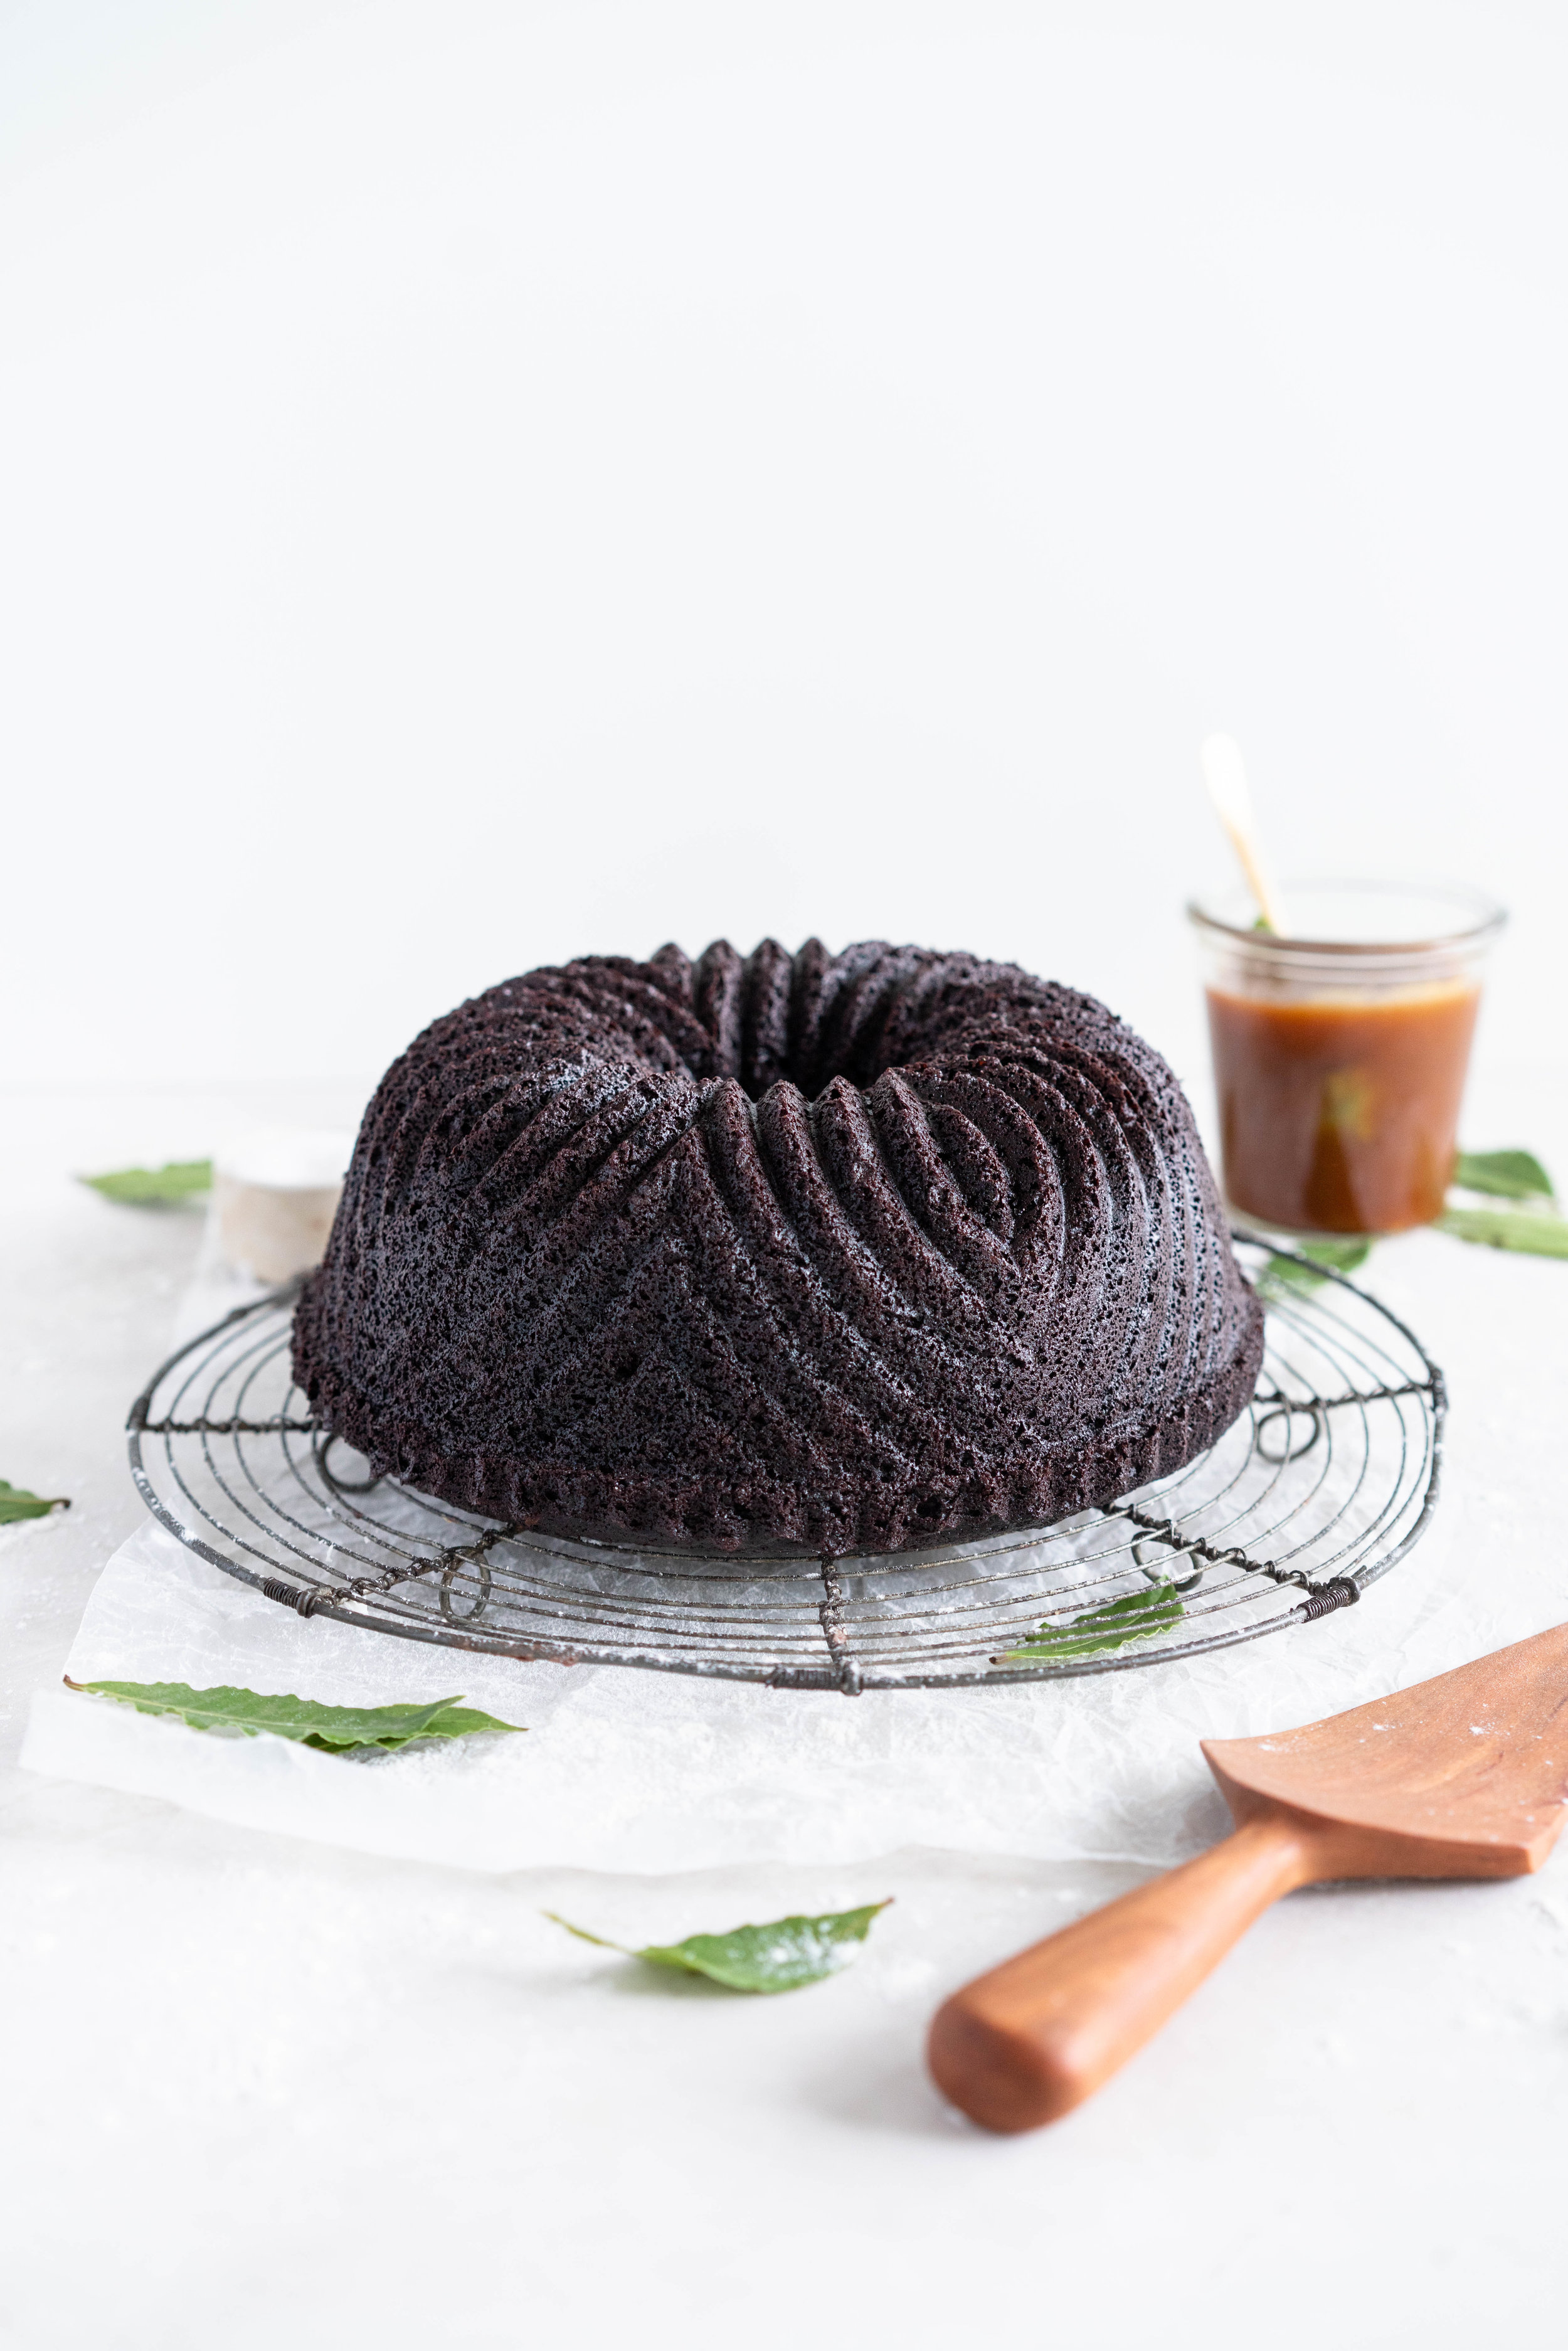 One Bowl Devil's food bundt cake with bay leaf caramel - a dense, moist chocolate bundt cake is loaded up with a lightly infused bay caramel. The cake is amazing alone, but with the caramel it is the perfect match. #devilsfoodcake #chocolatebundtcake #baycaramel